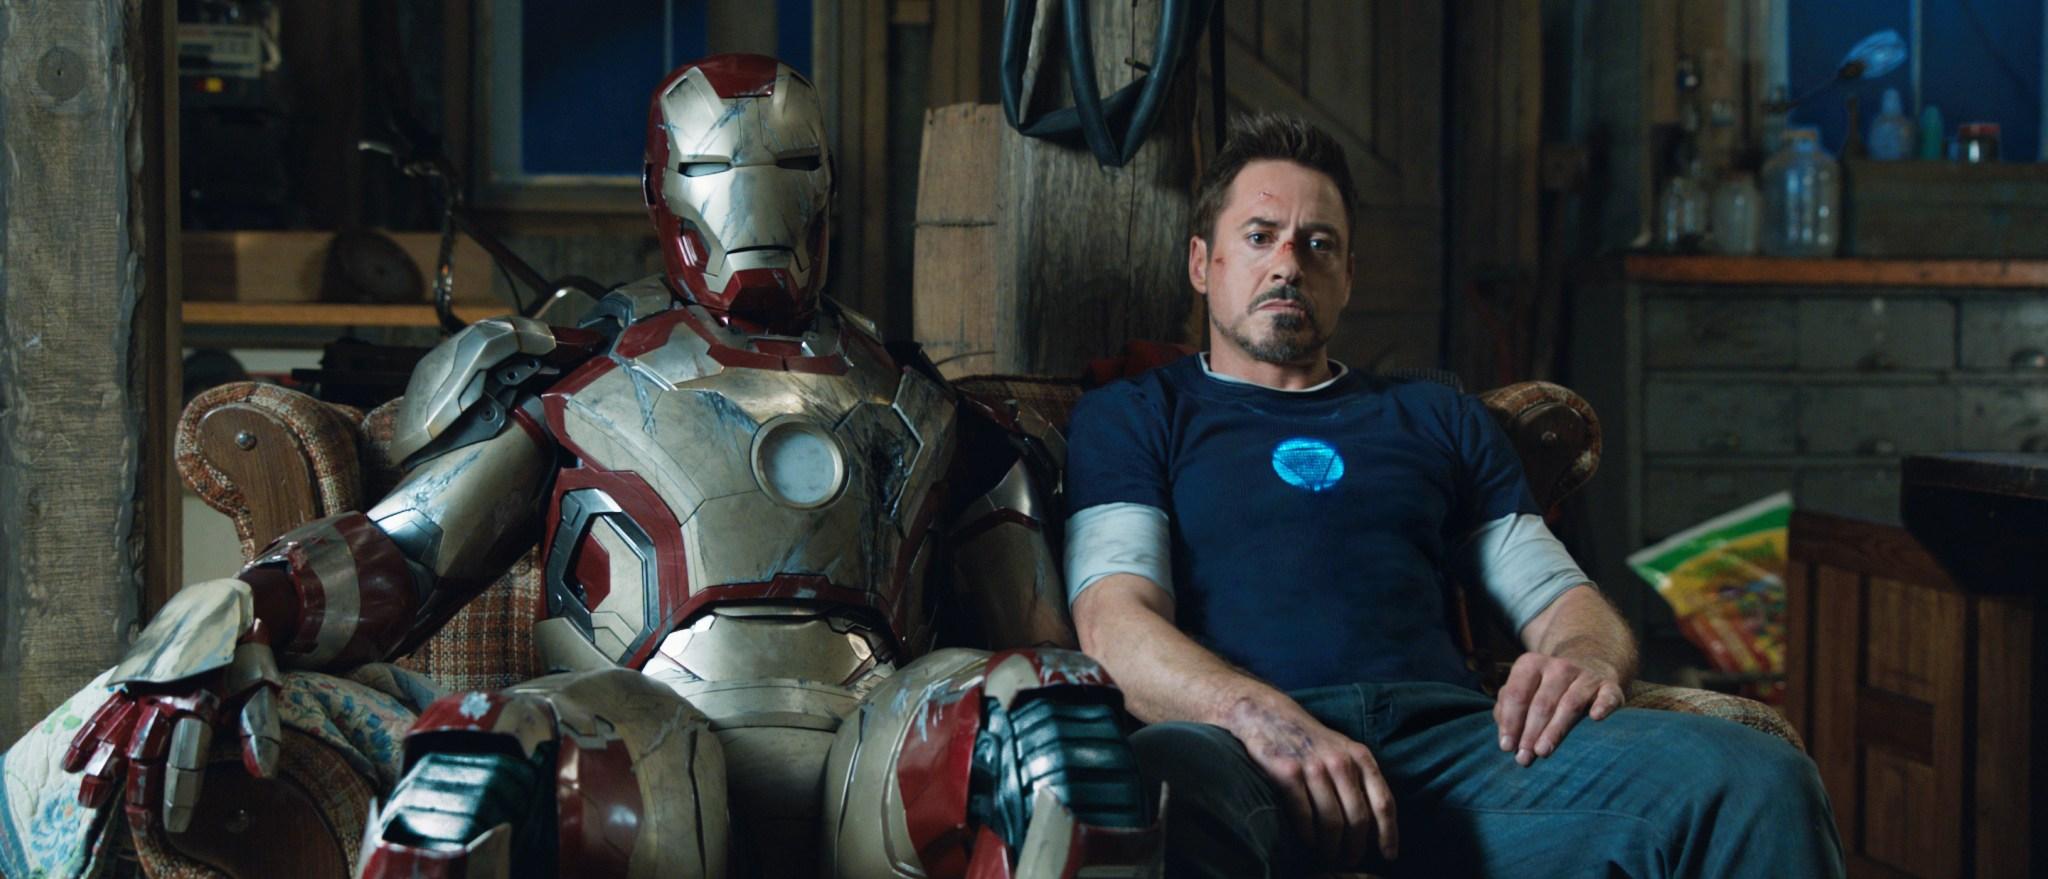 Marvel MovieSpoon.com